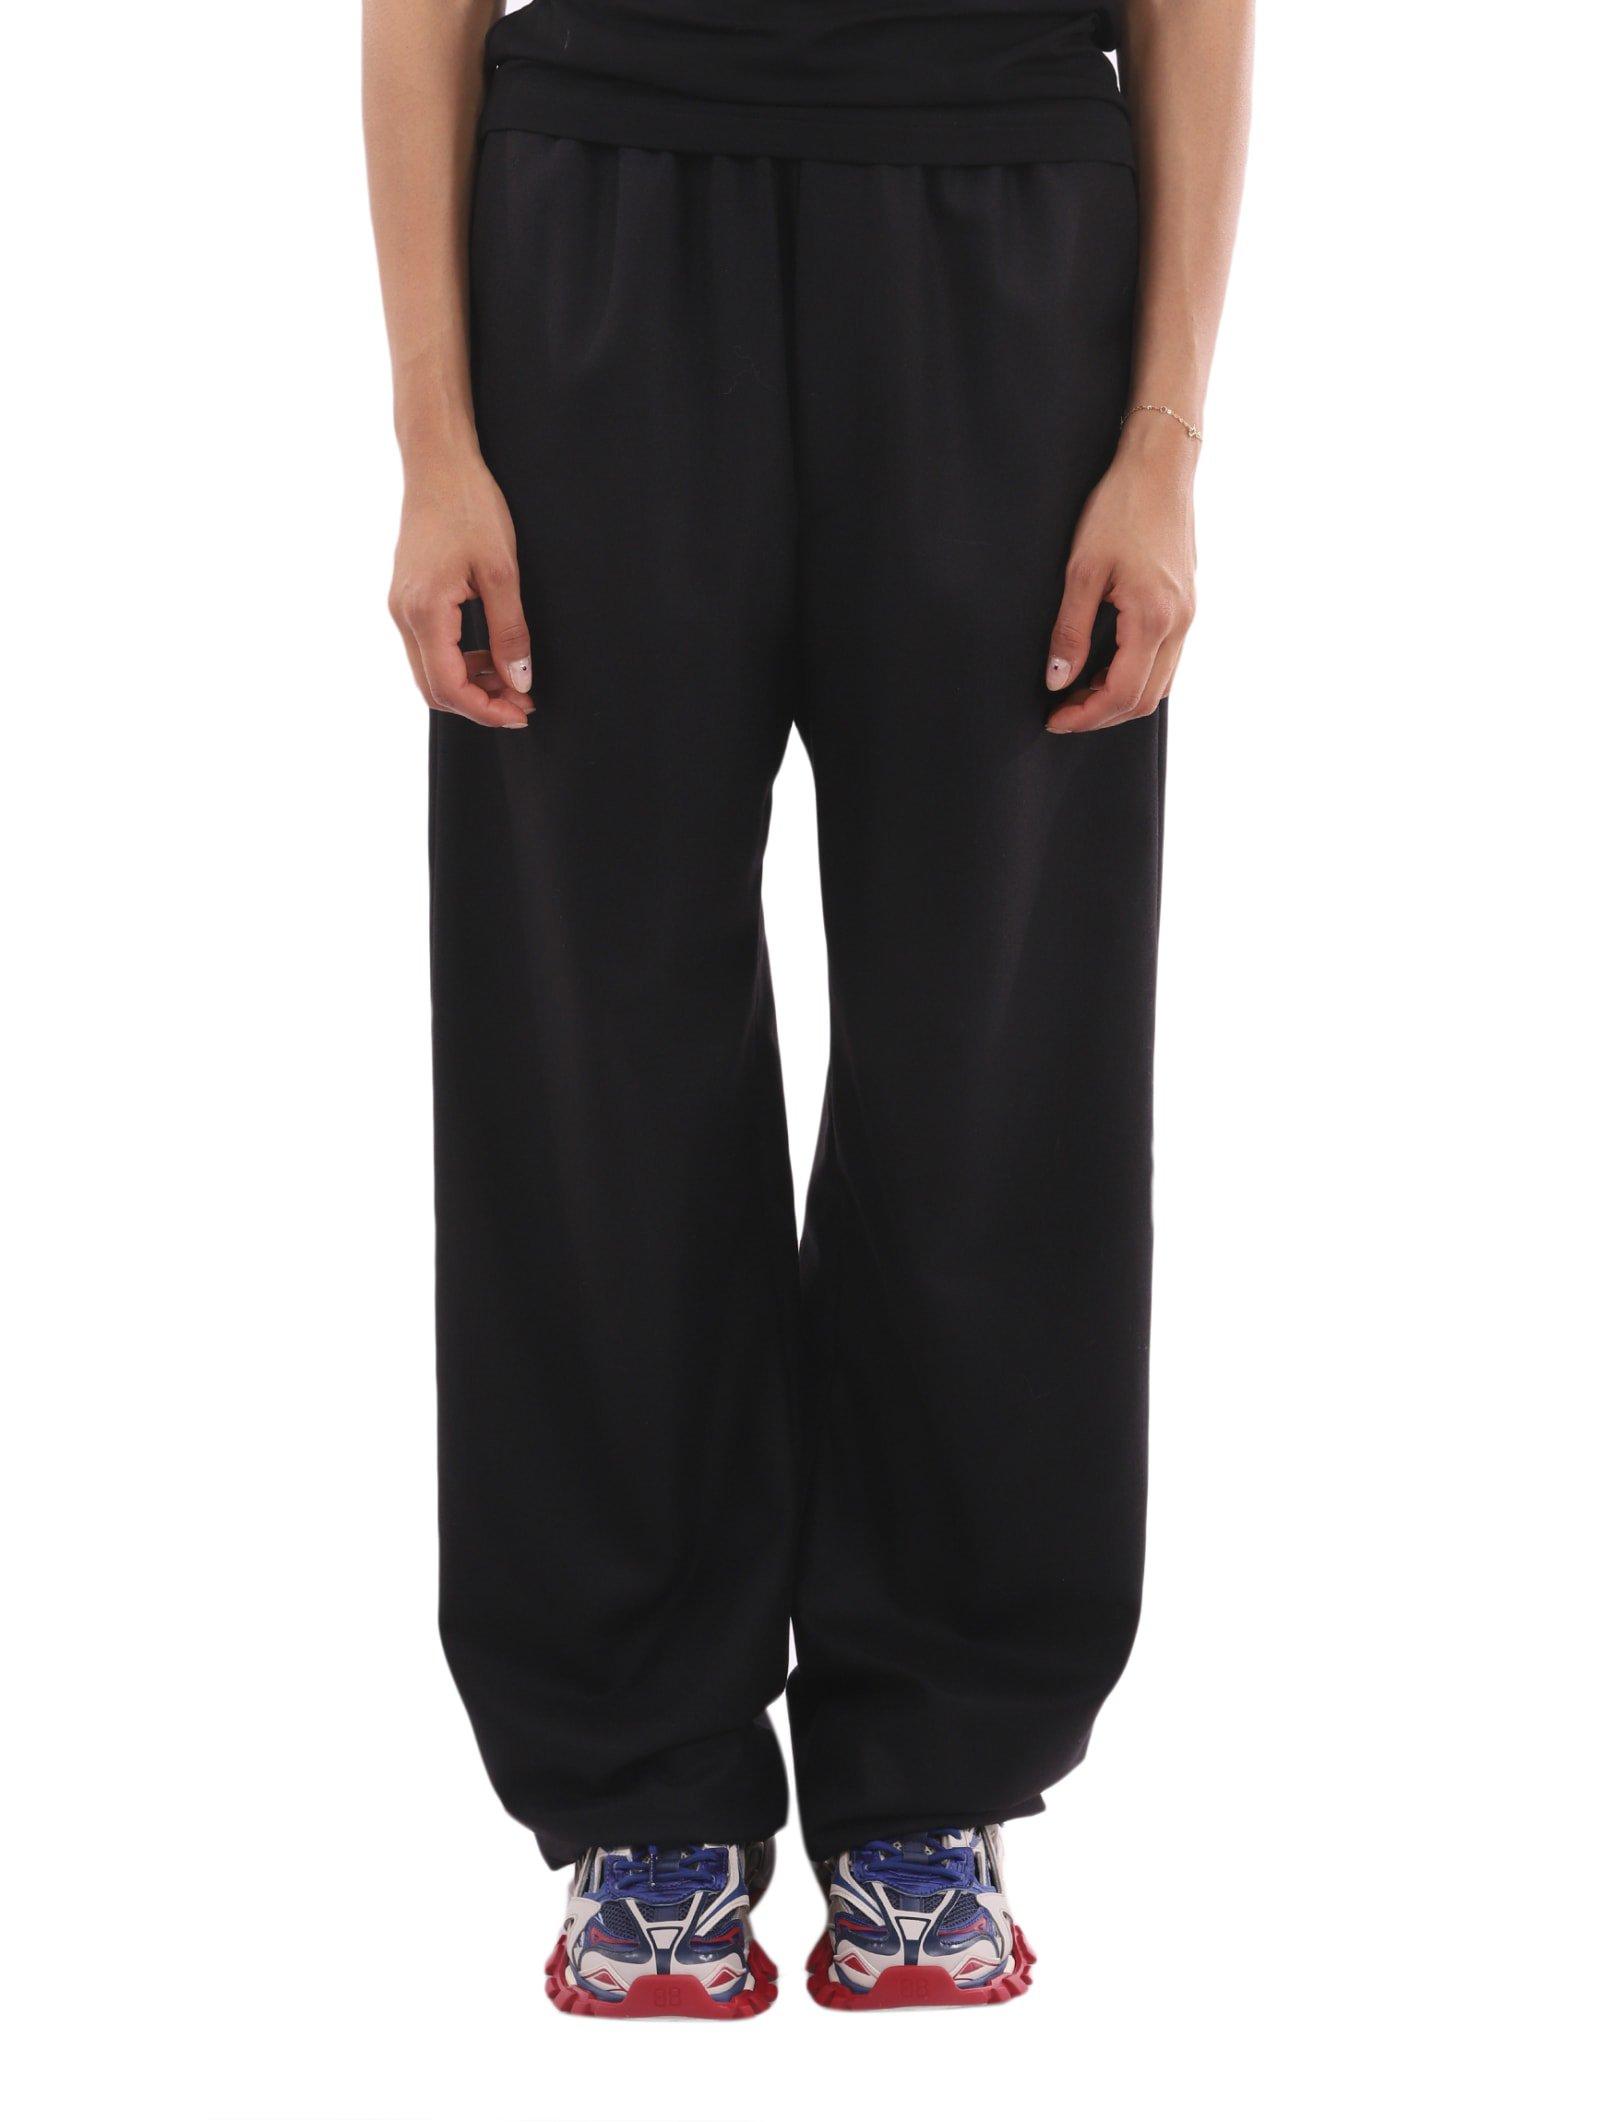 Balenciaga Black Cashmere Trousers